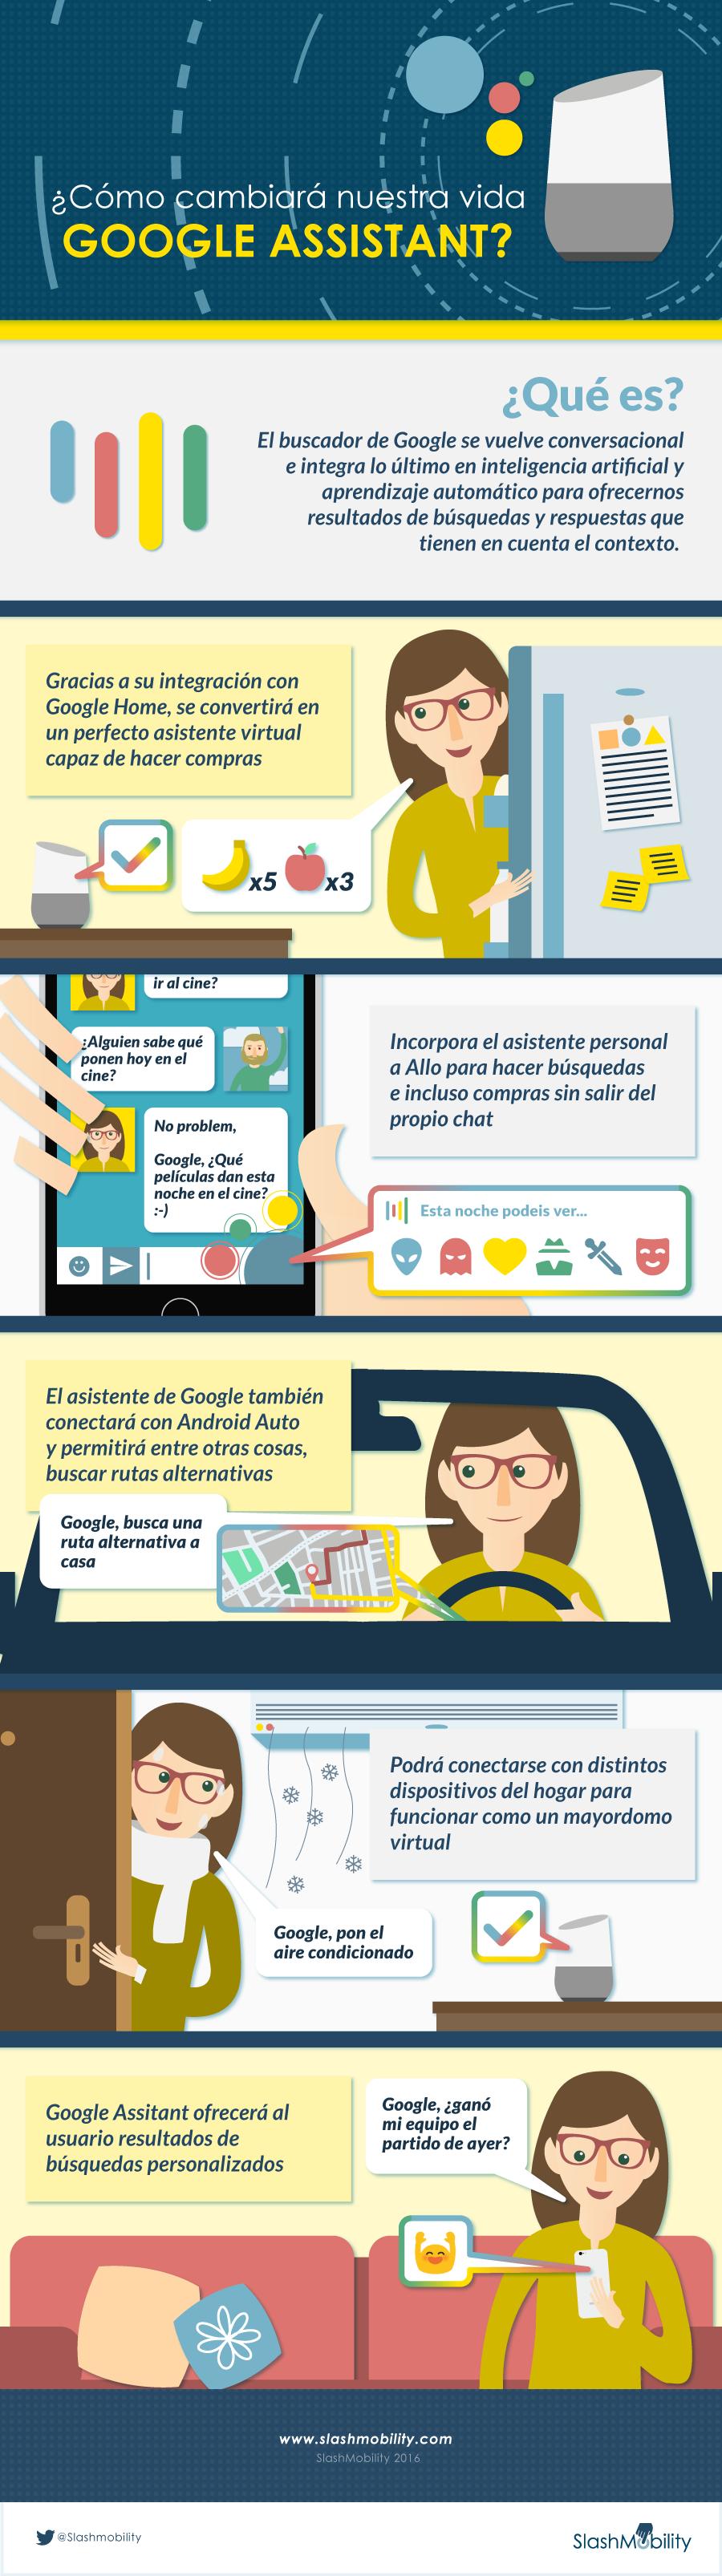 google-assistant-infografia